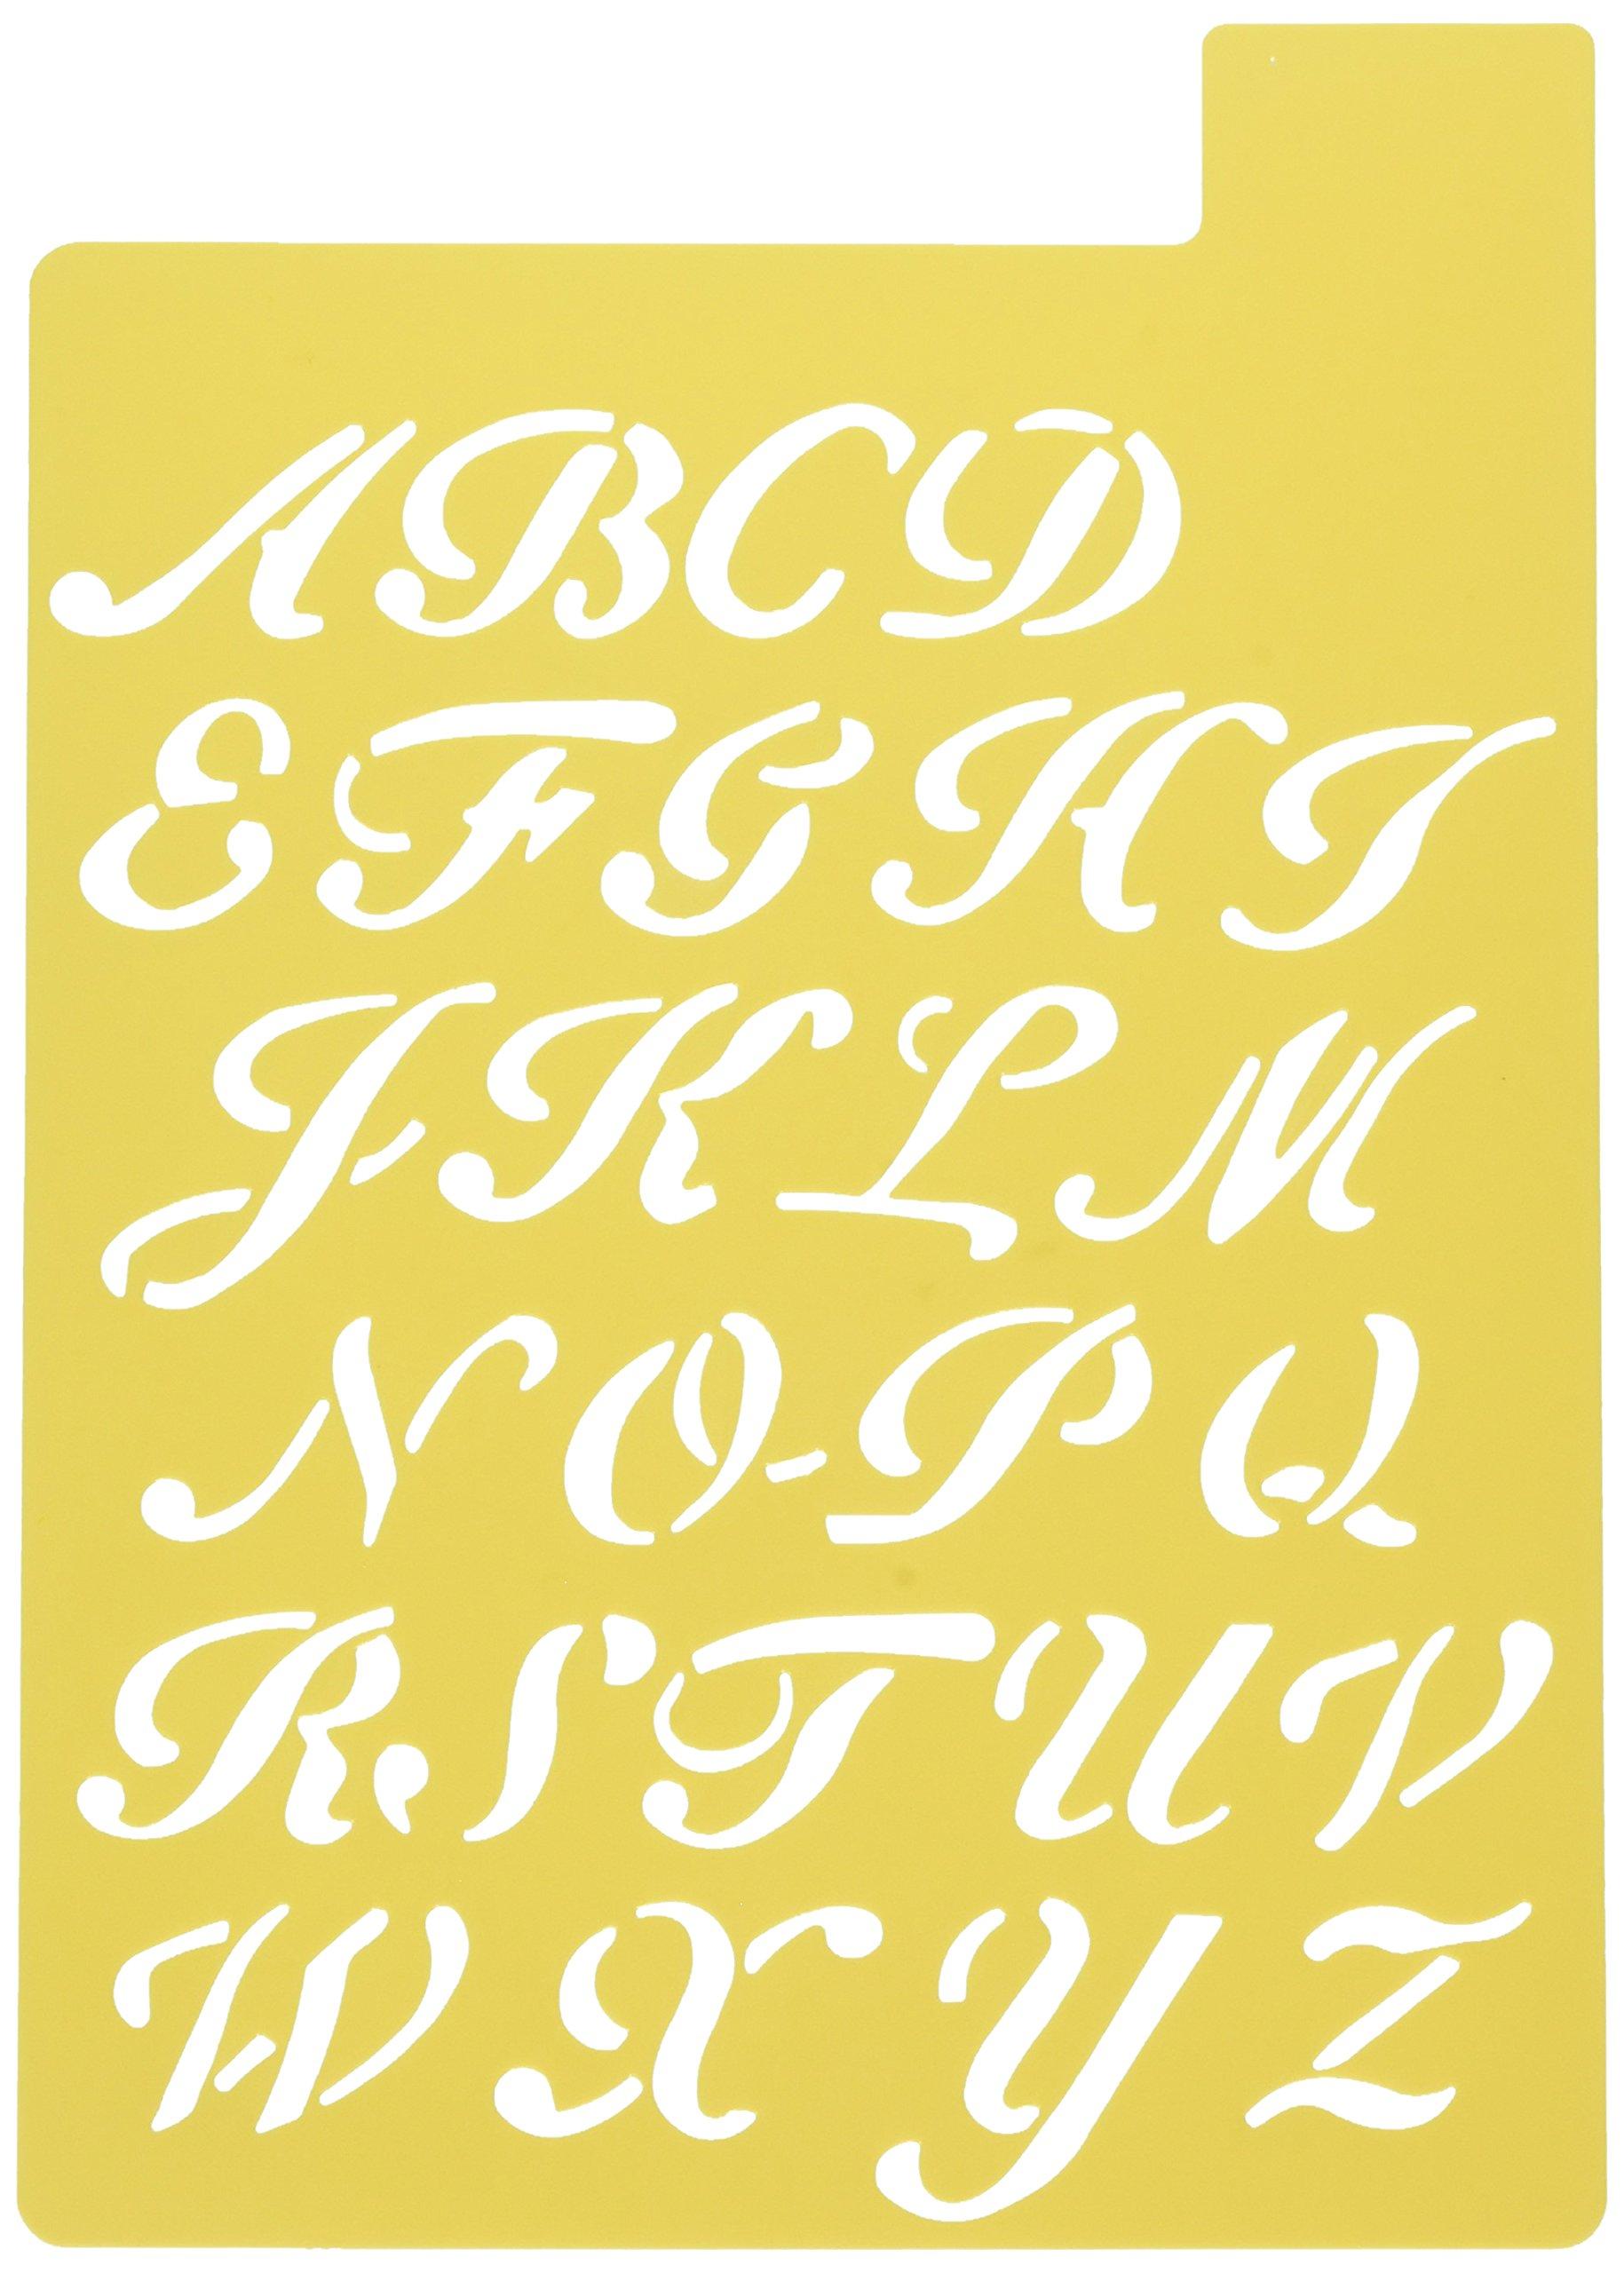 Darice 121725 Upper Case Alphabet Stencil, 3 Fonts in 1, 1-Inch by Darice (Image #3)